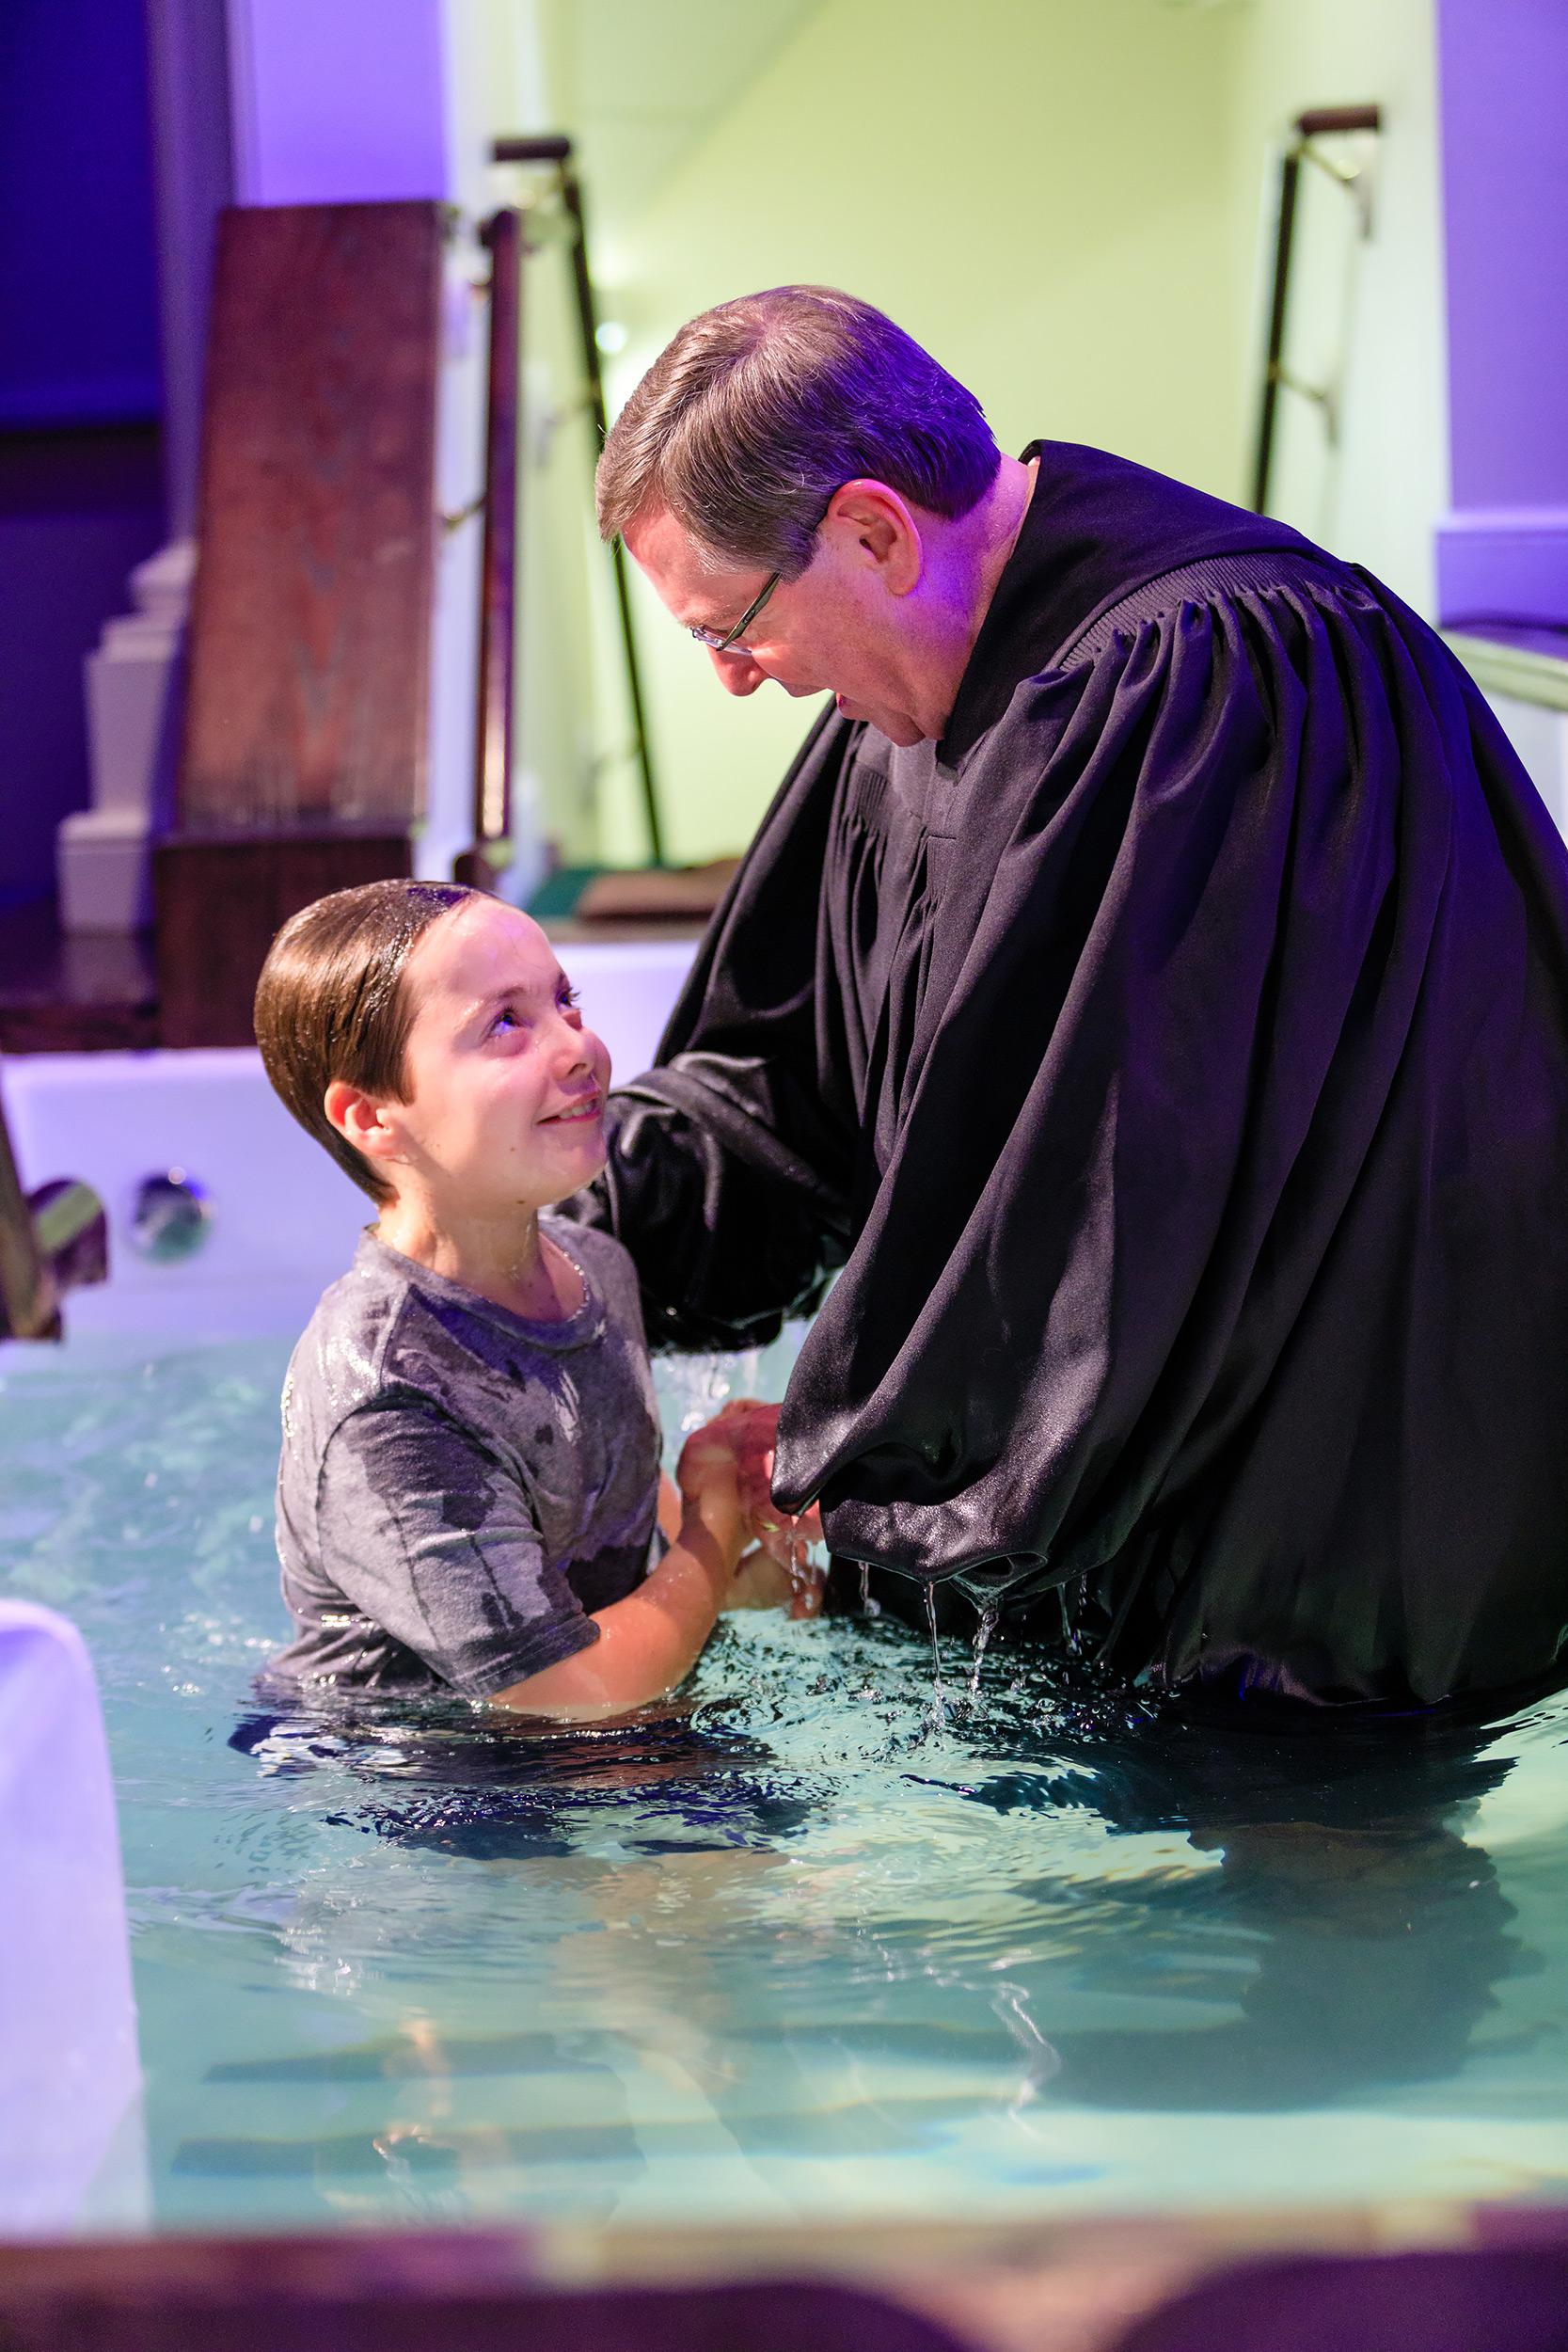 20170129-Baptism-Worship-293.jpg